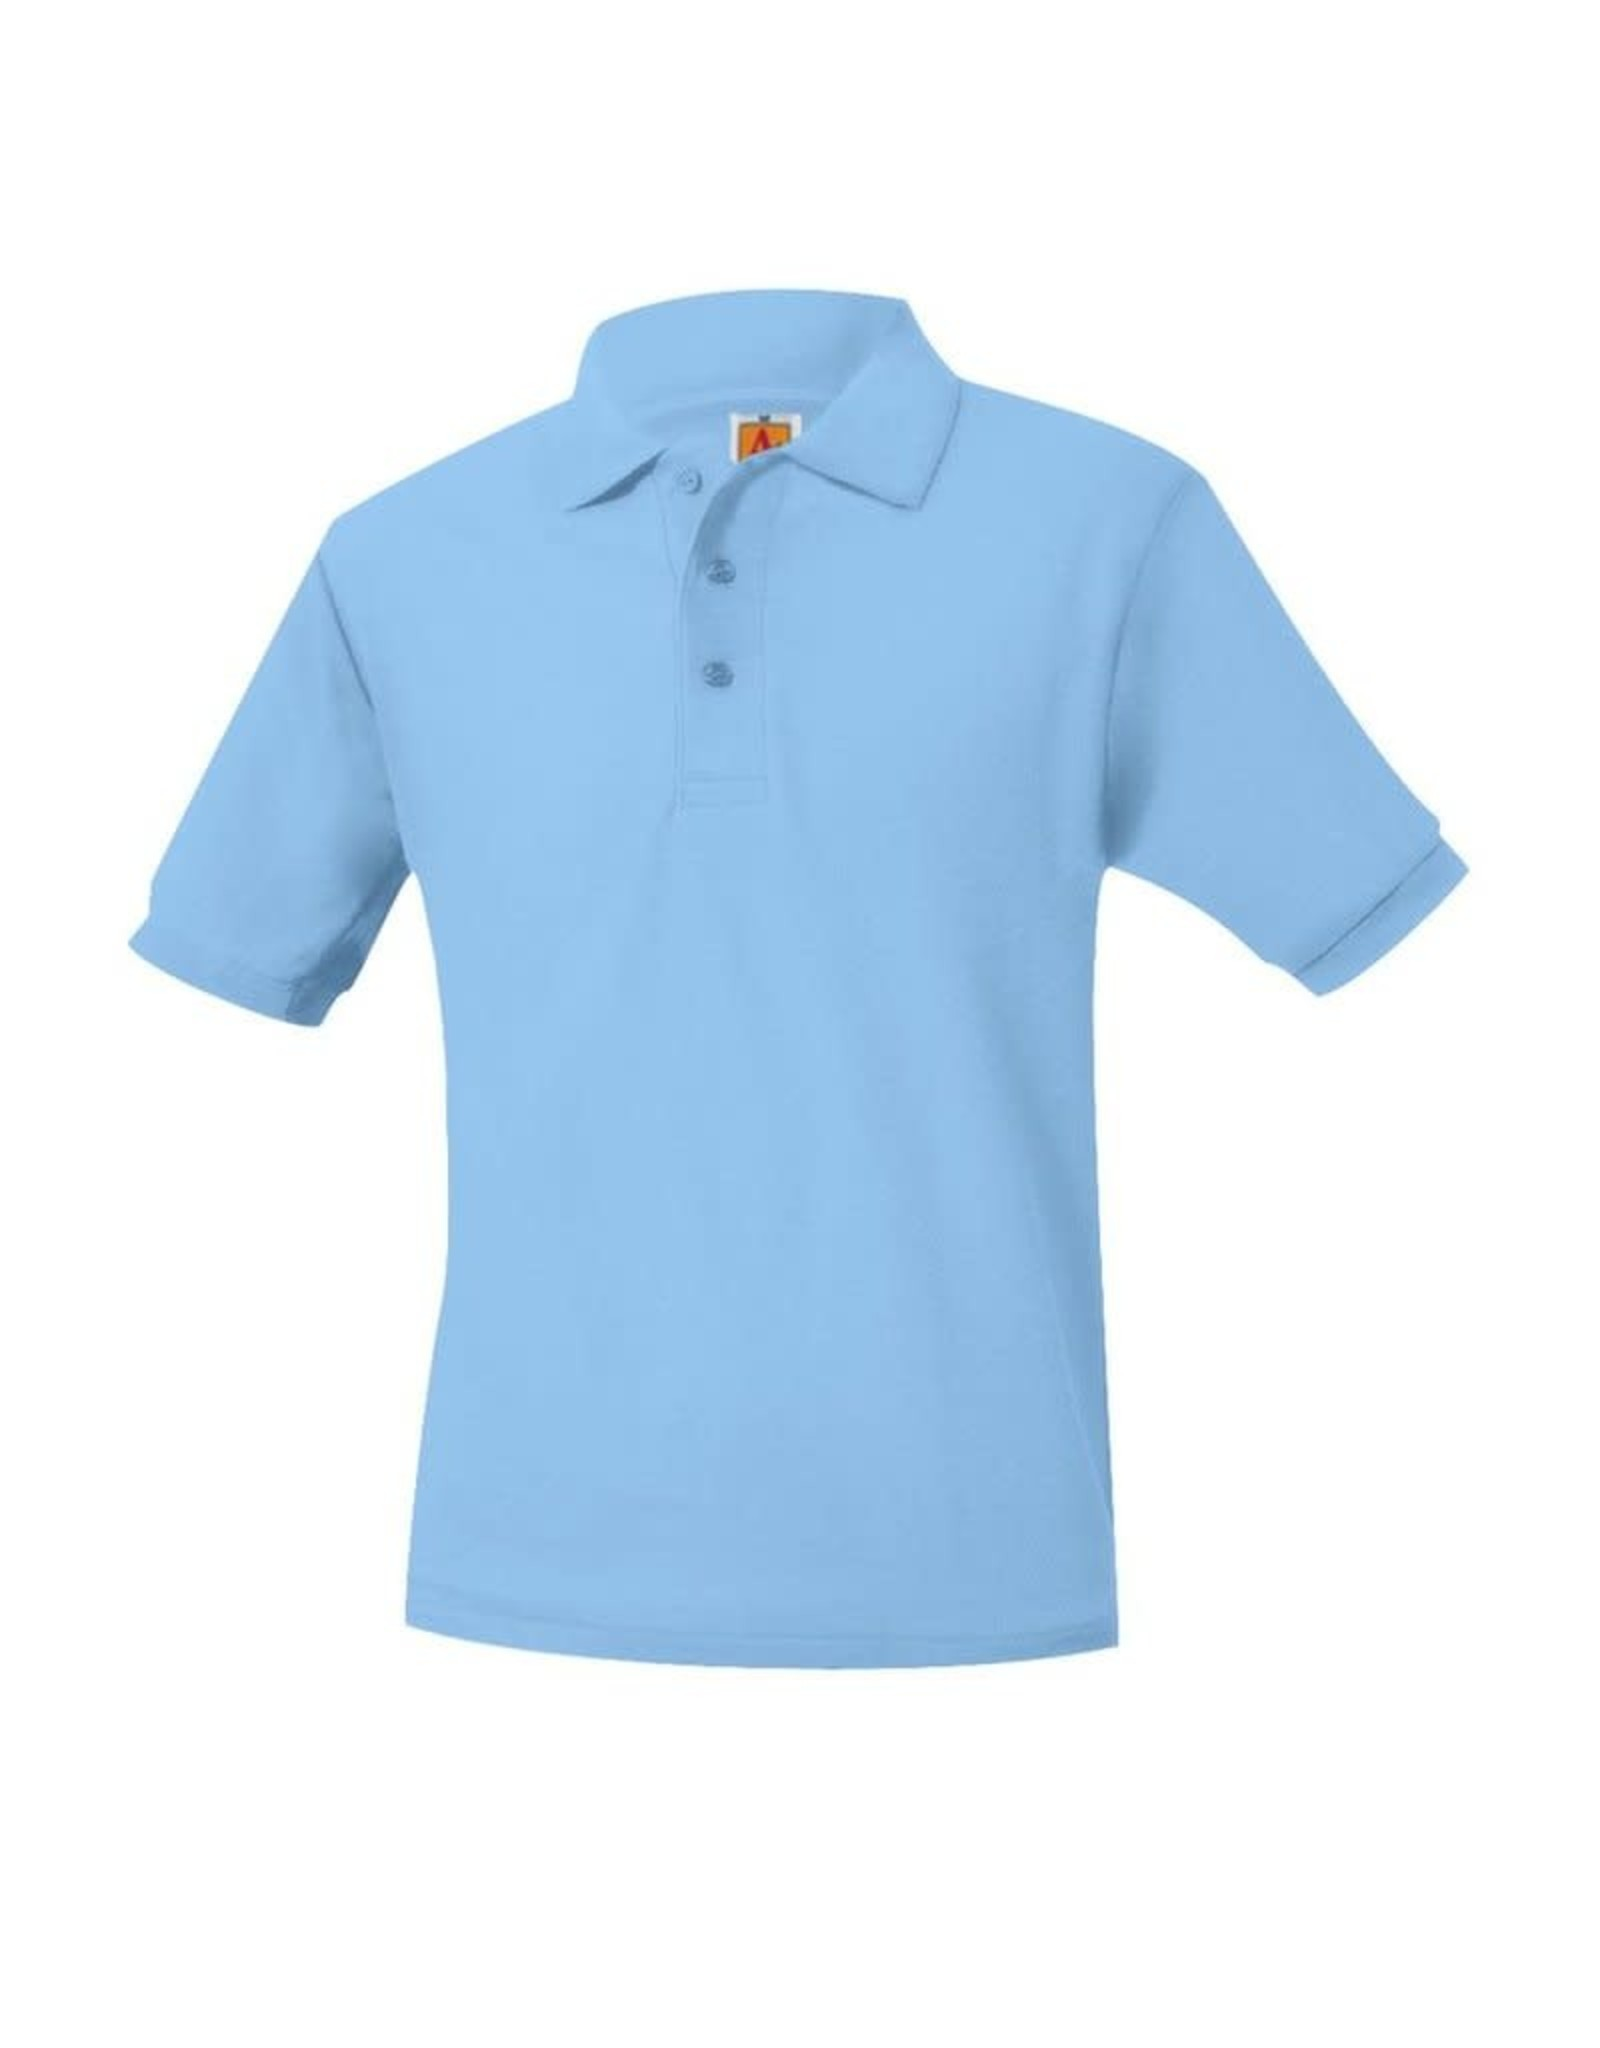 UNIFORM Pique Polo Short Sleeve Shirt  Saint Andrew